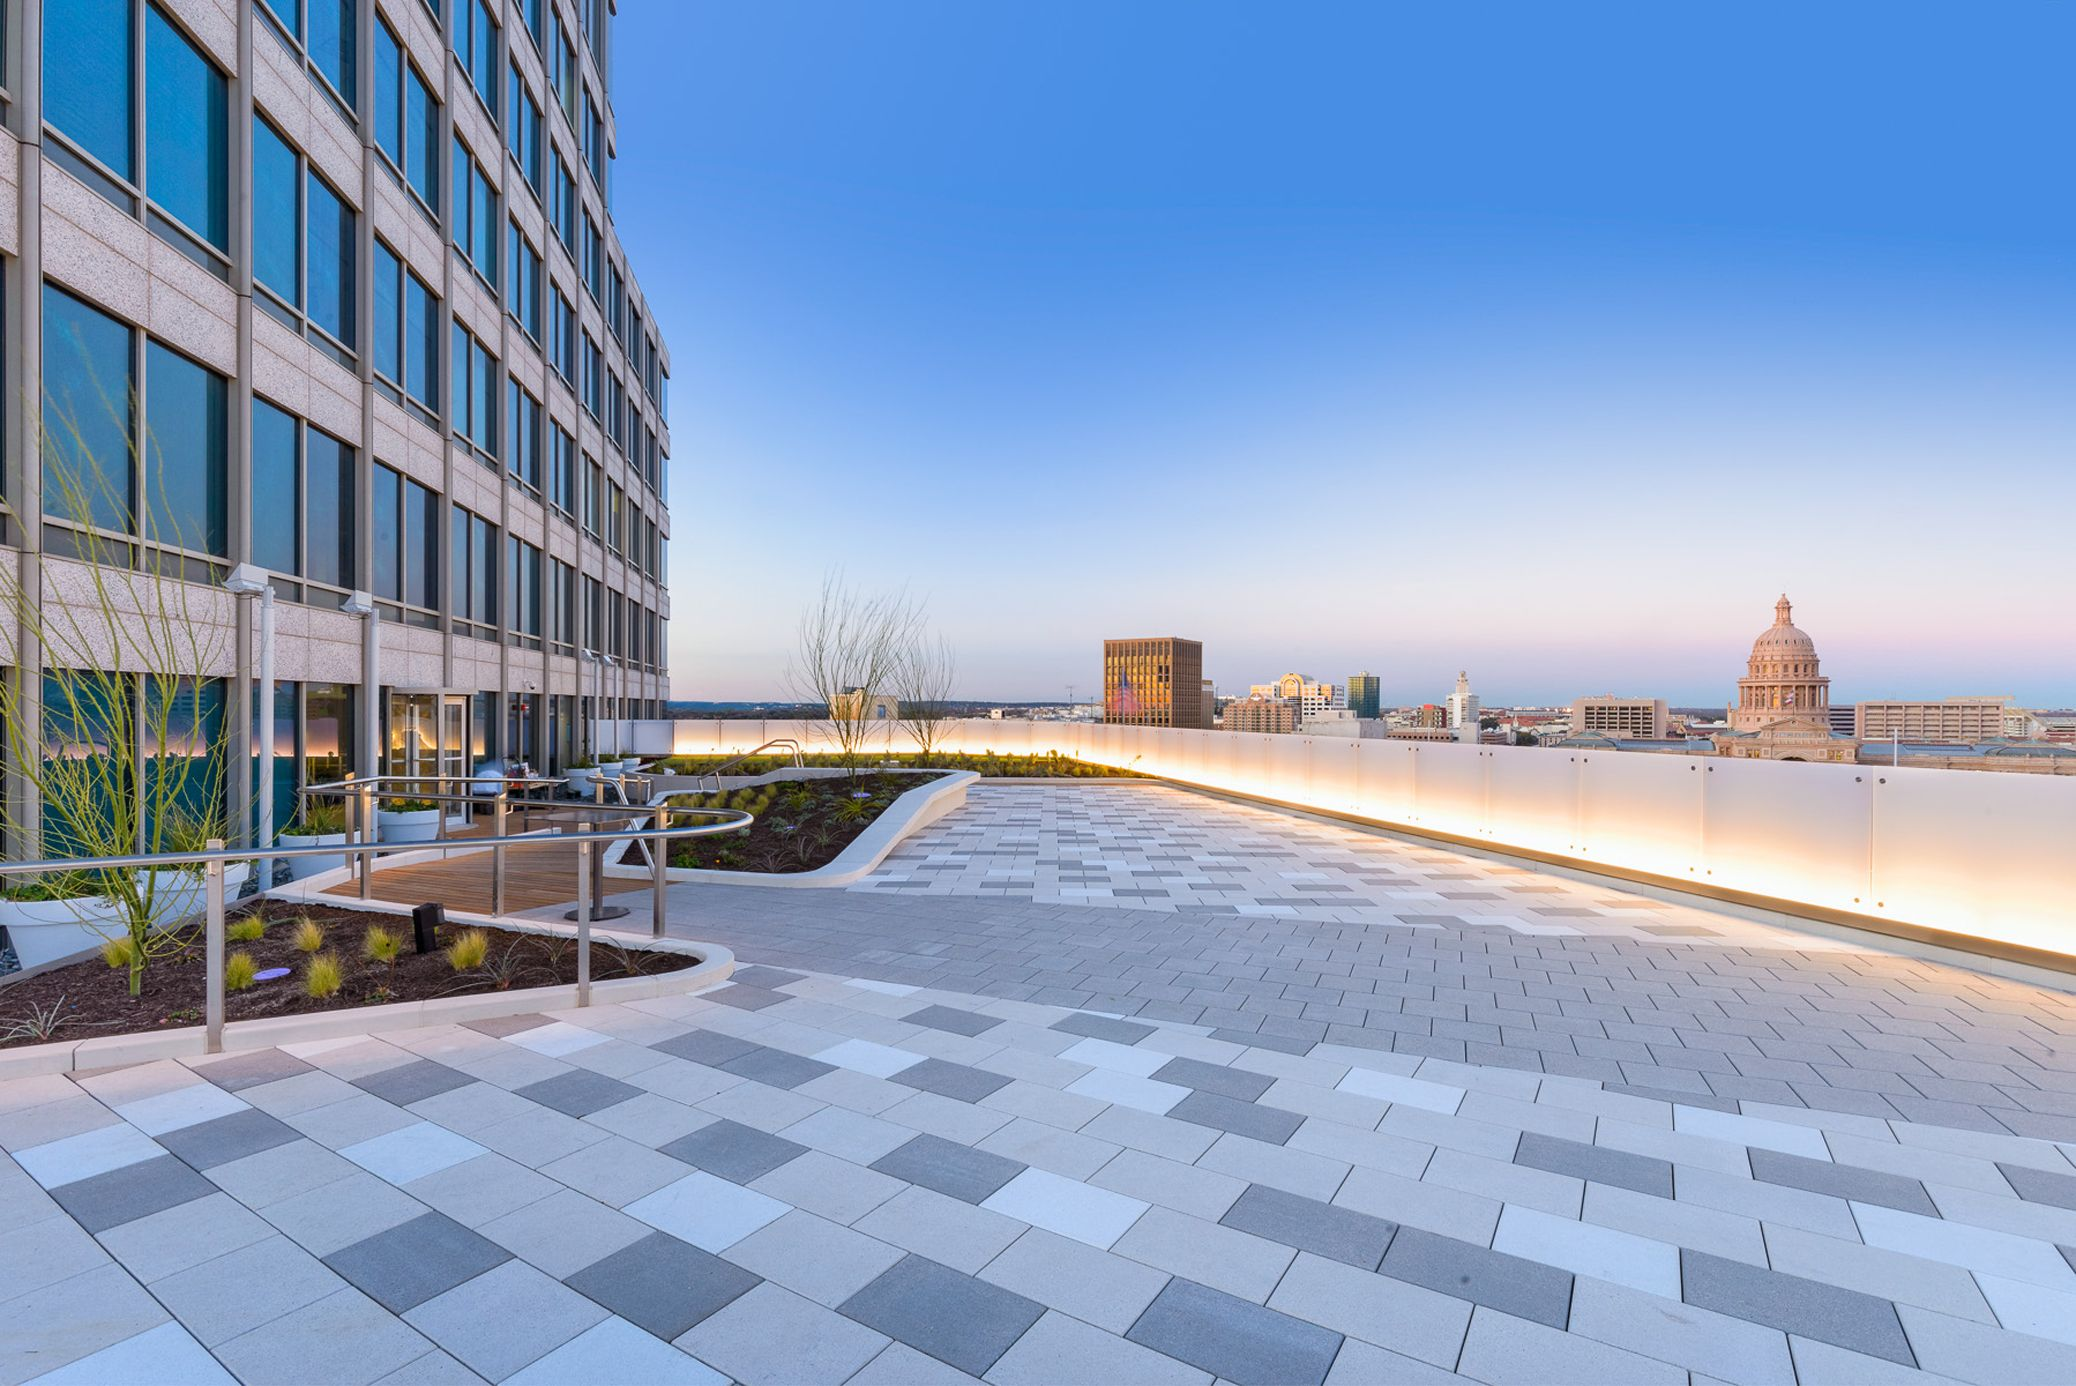 37 best durham green roof inspiration images landscaping gardens landscape architecture design